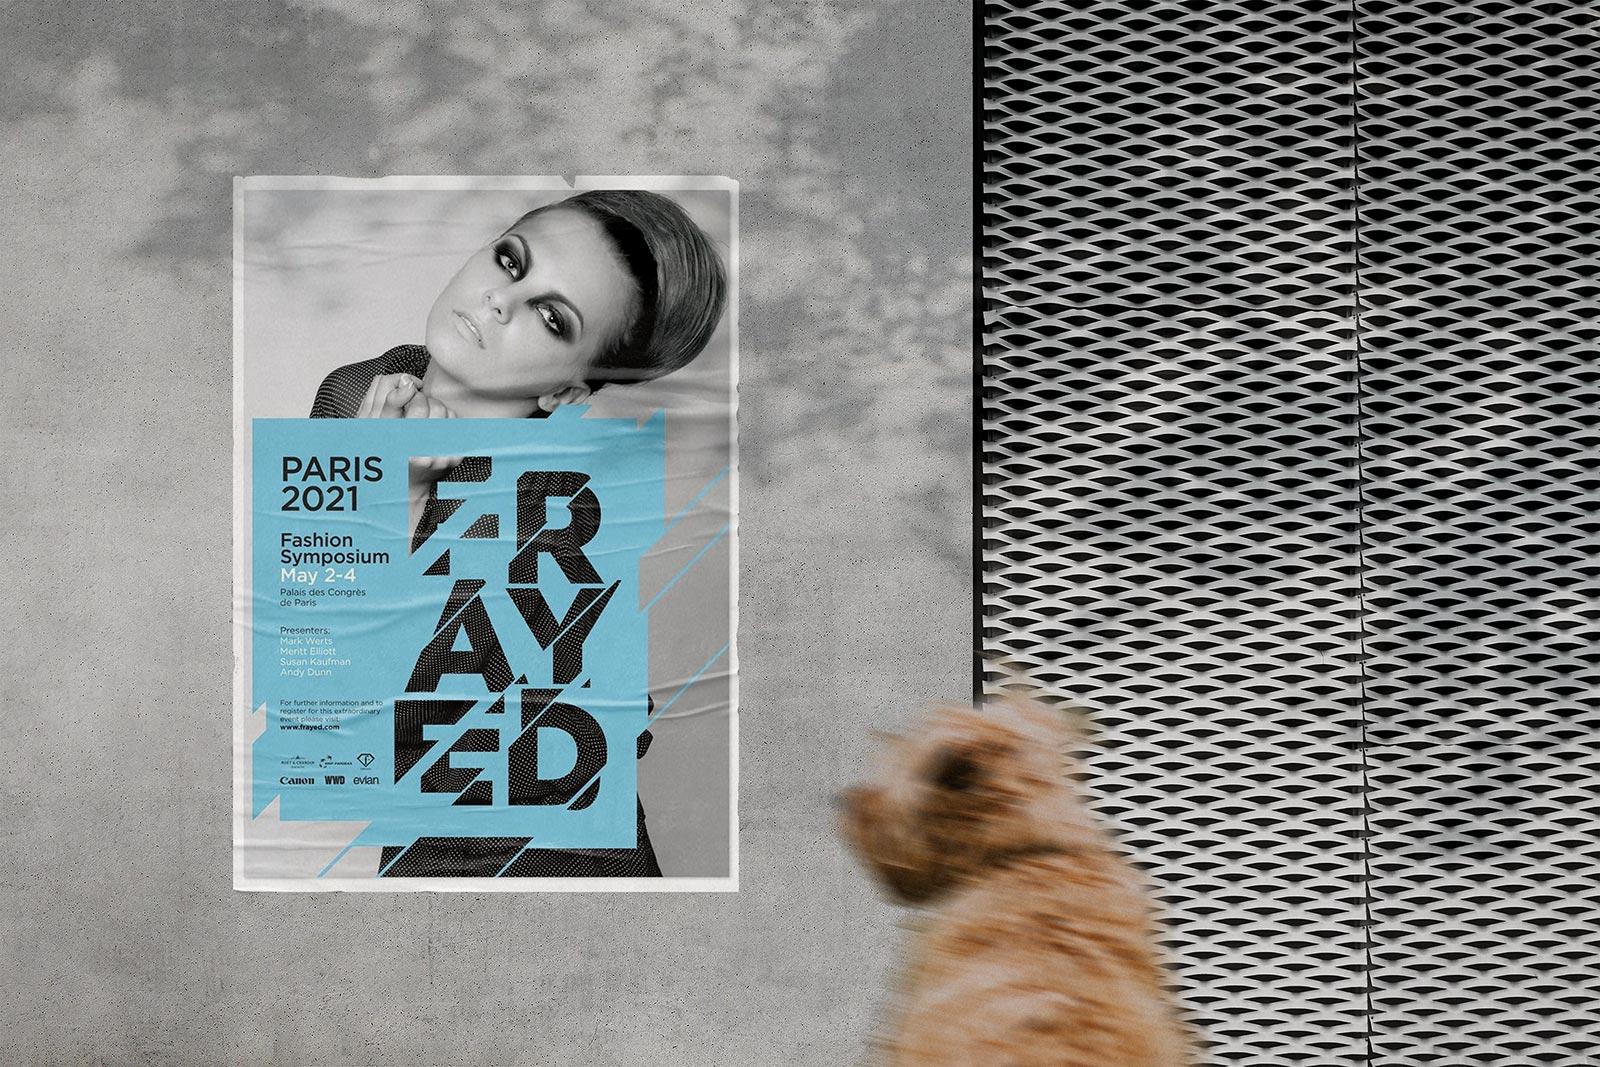 Free-Street-Wall-Glued-Poster-Mockup-PSD